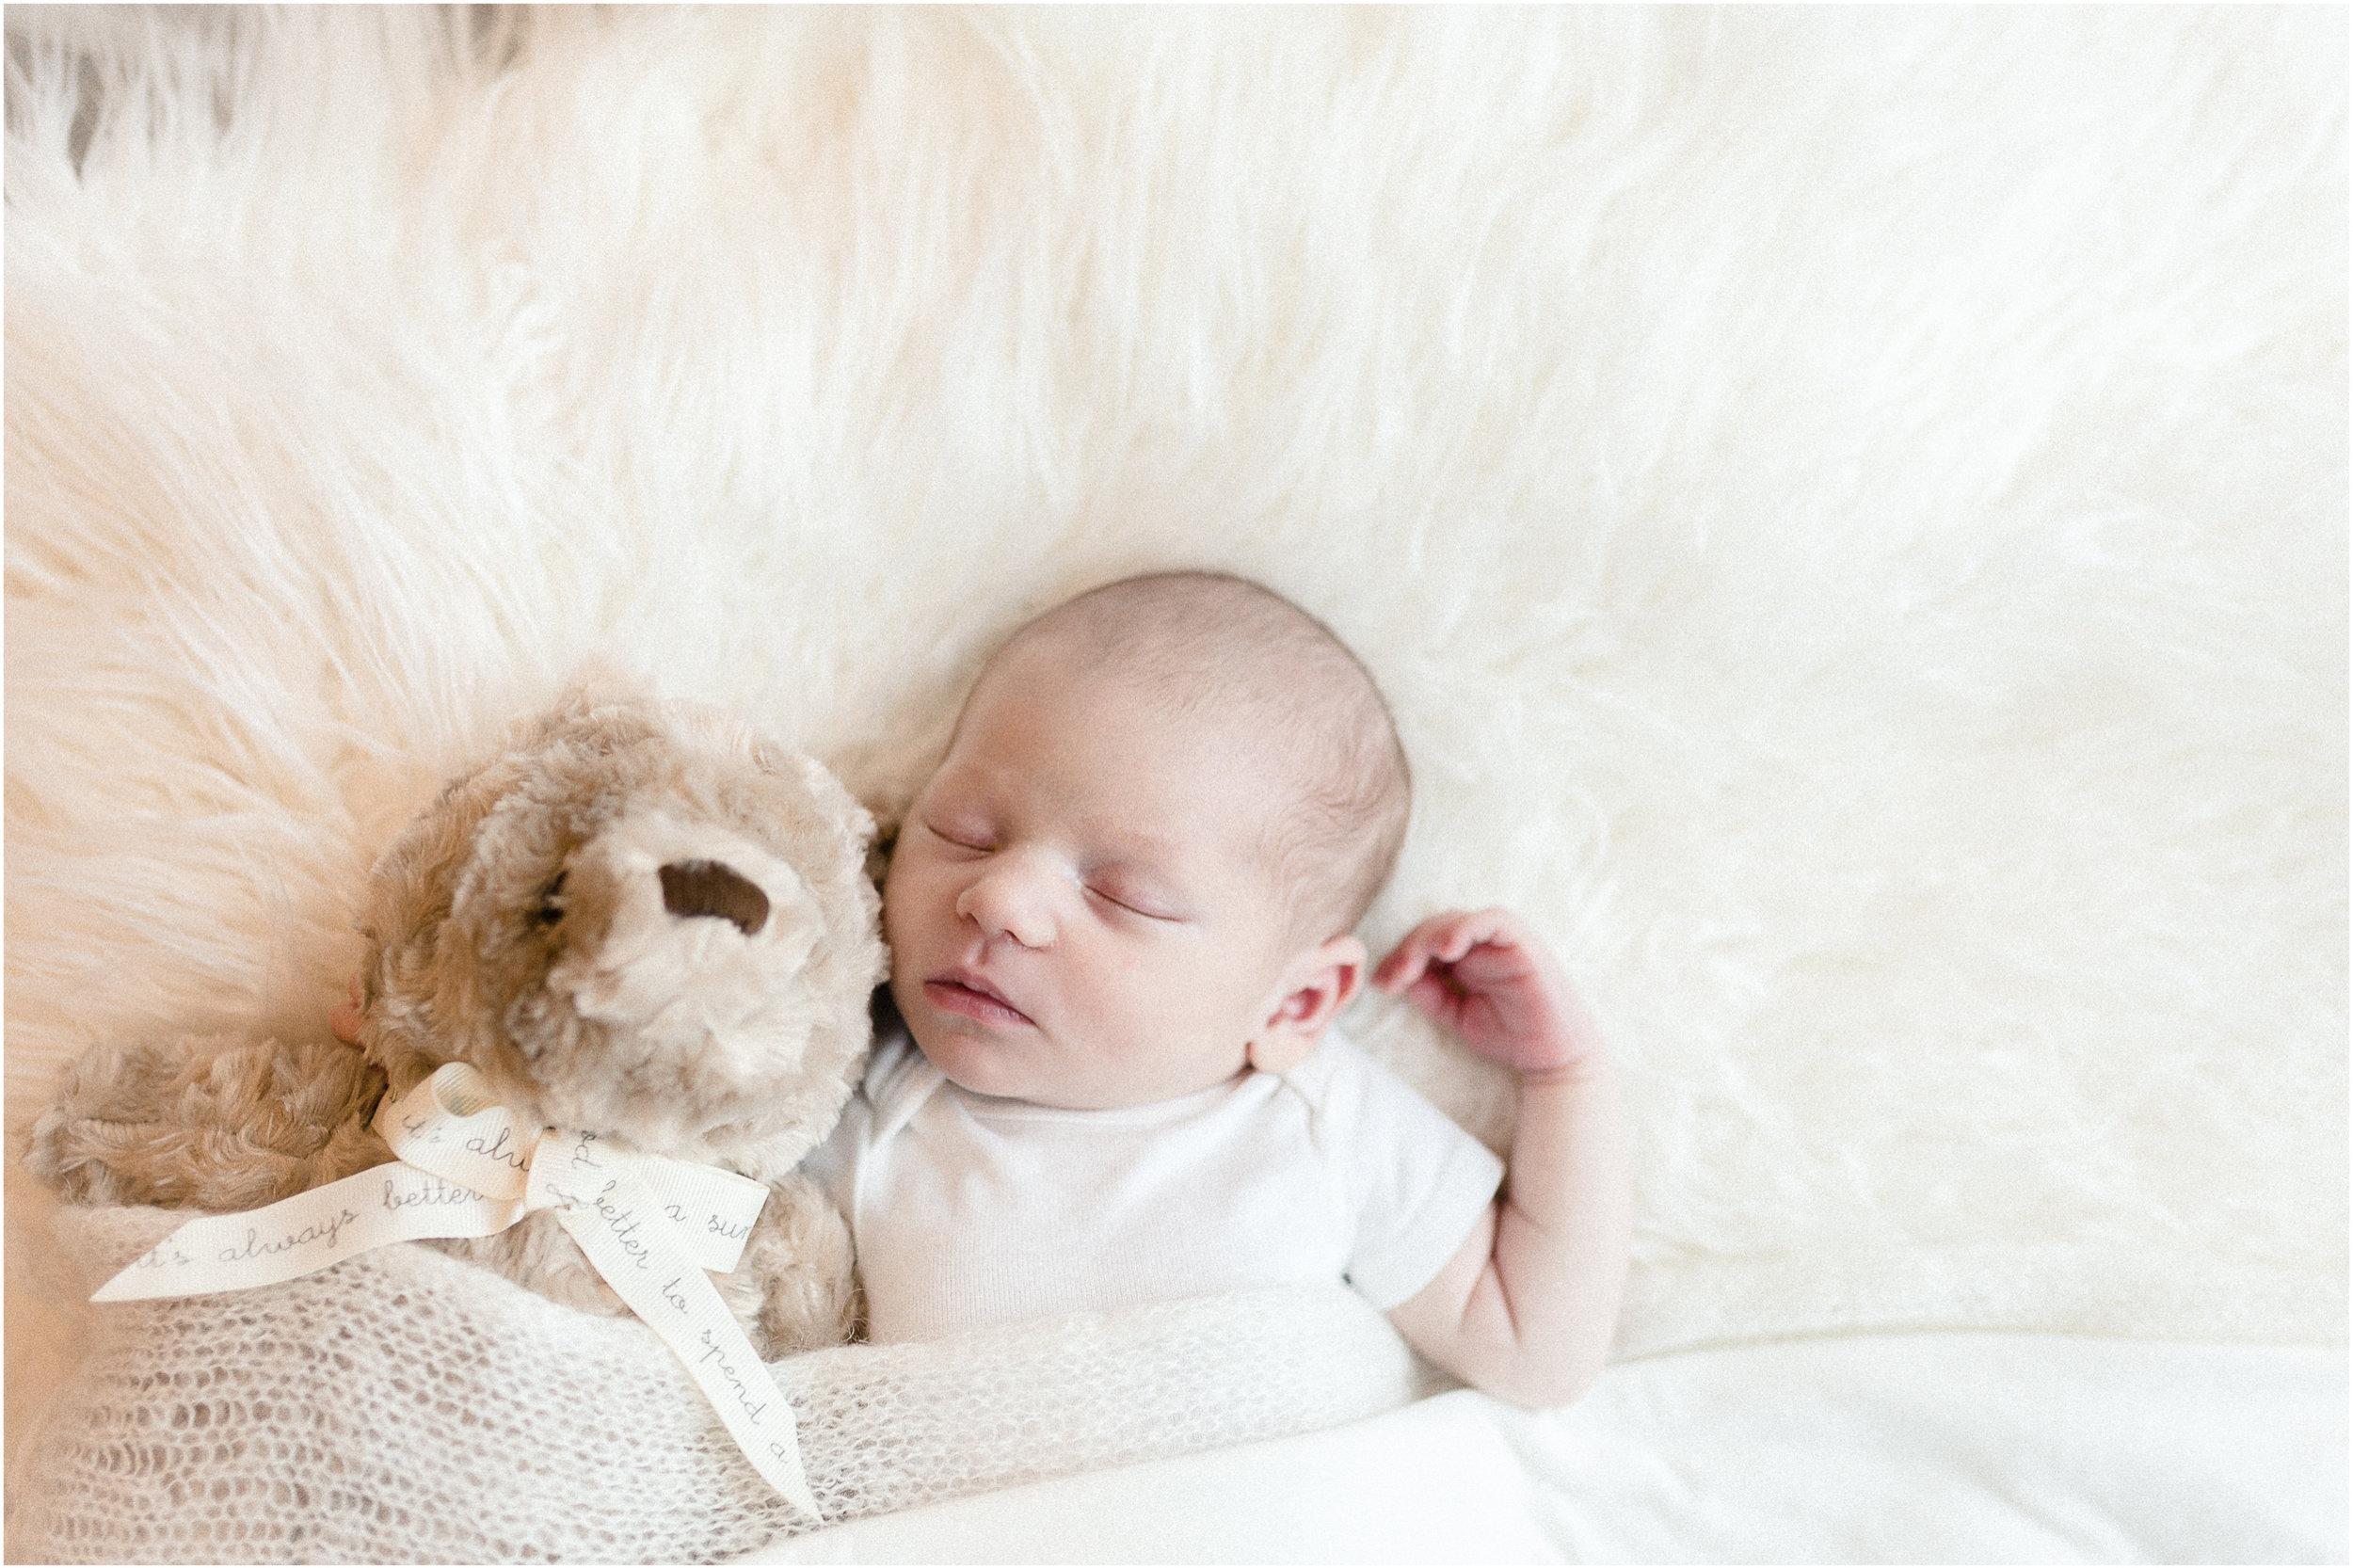 chicago newborn baby with teddy bear sleeping lifestyle family photographer jenny grimm